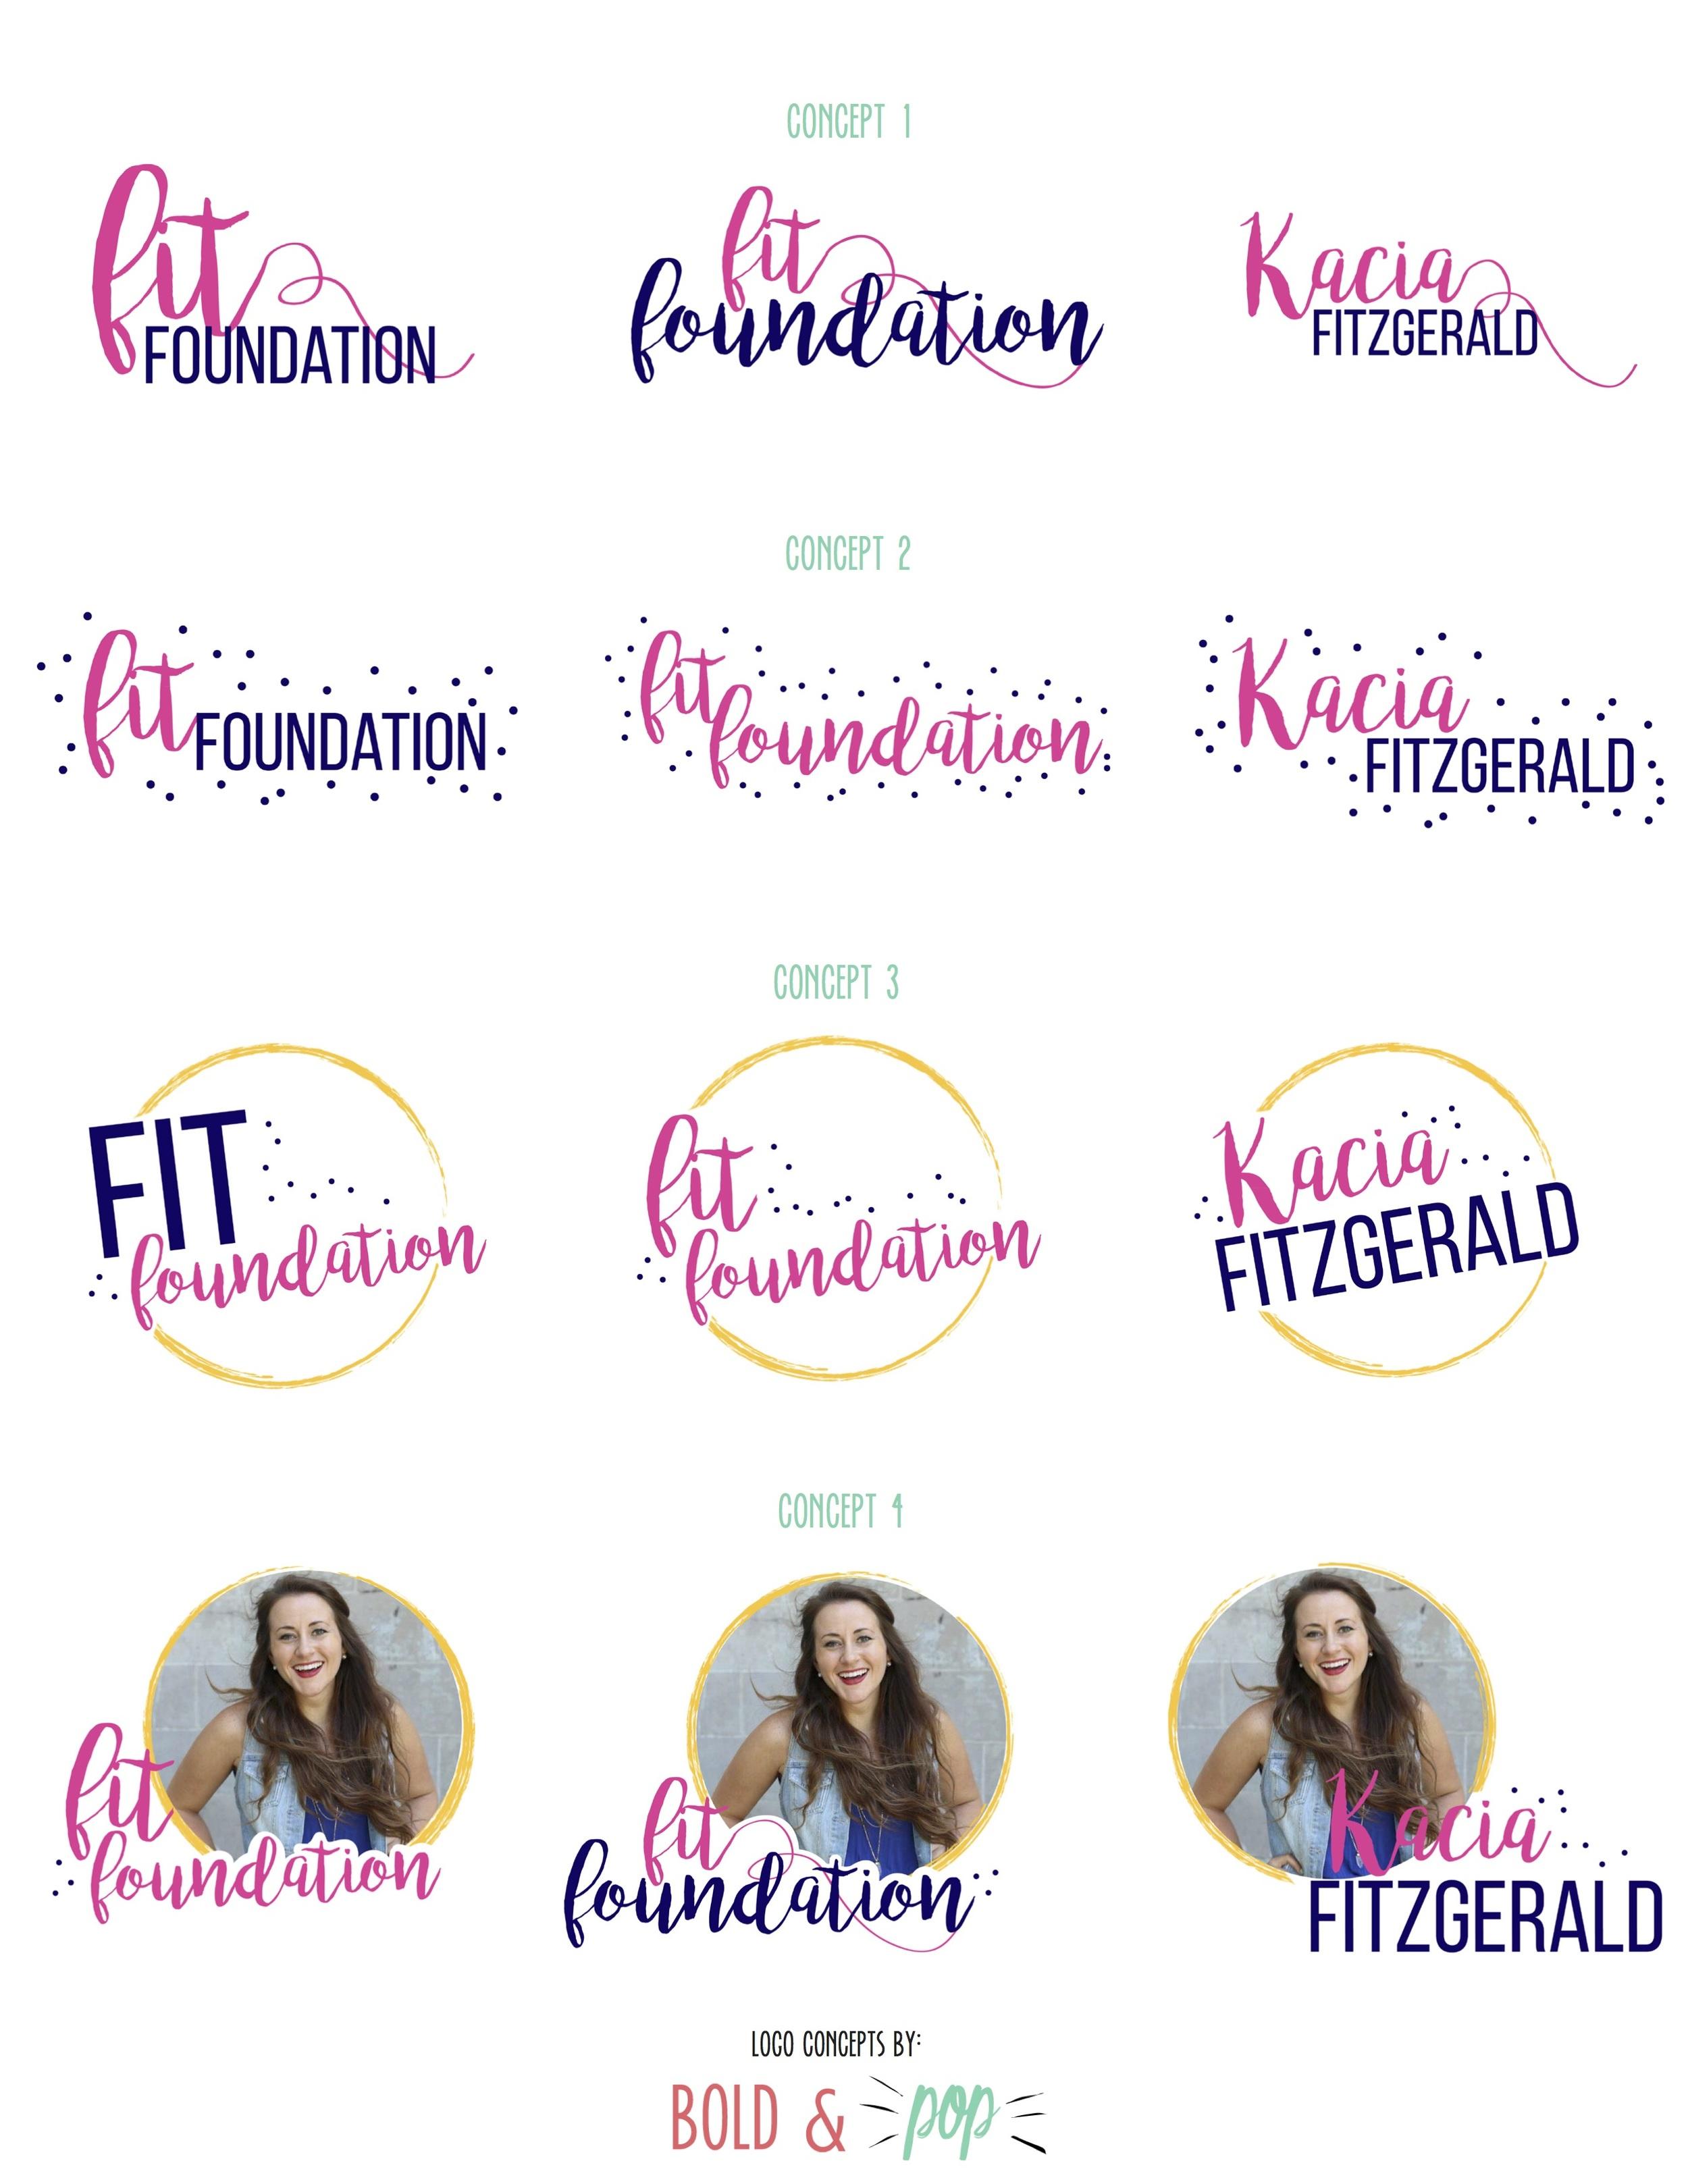 Bold & Pop : Fit Foundation Branding & Website Design